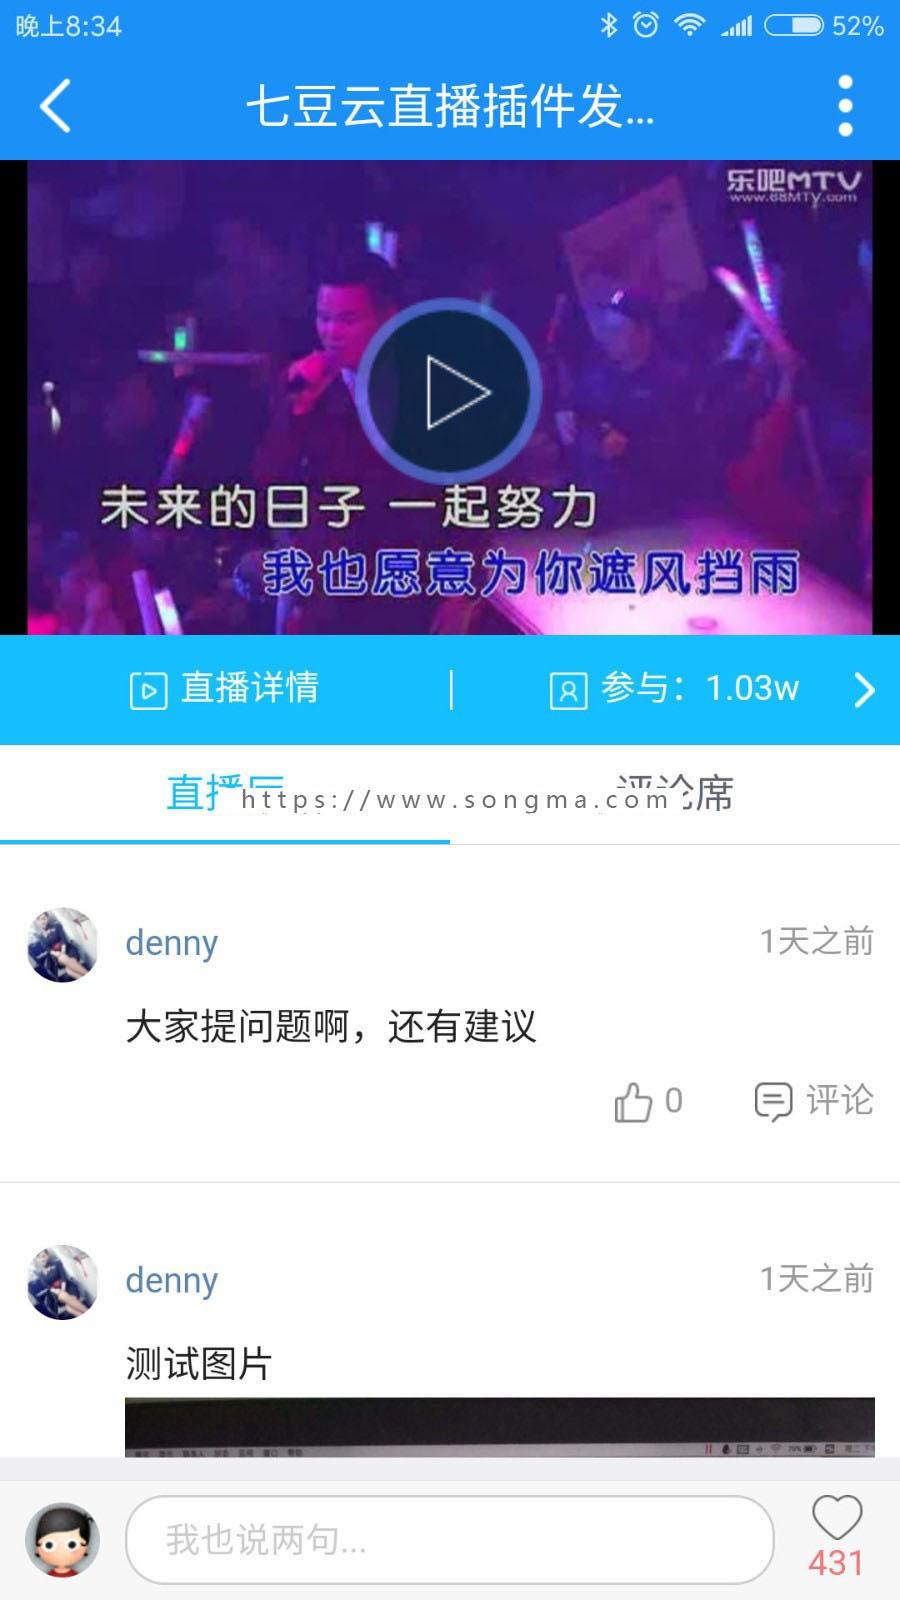 discuz插件 【七豆】直播 1.0.1 (qidou_video_live) DZ插件